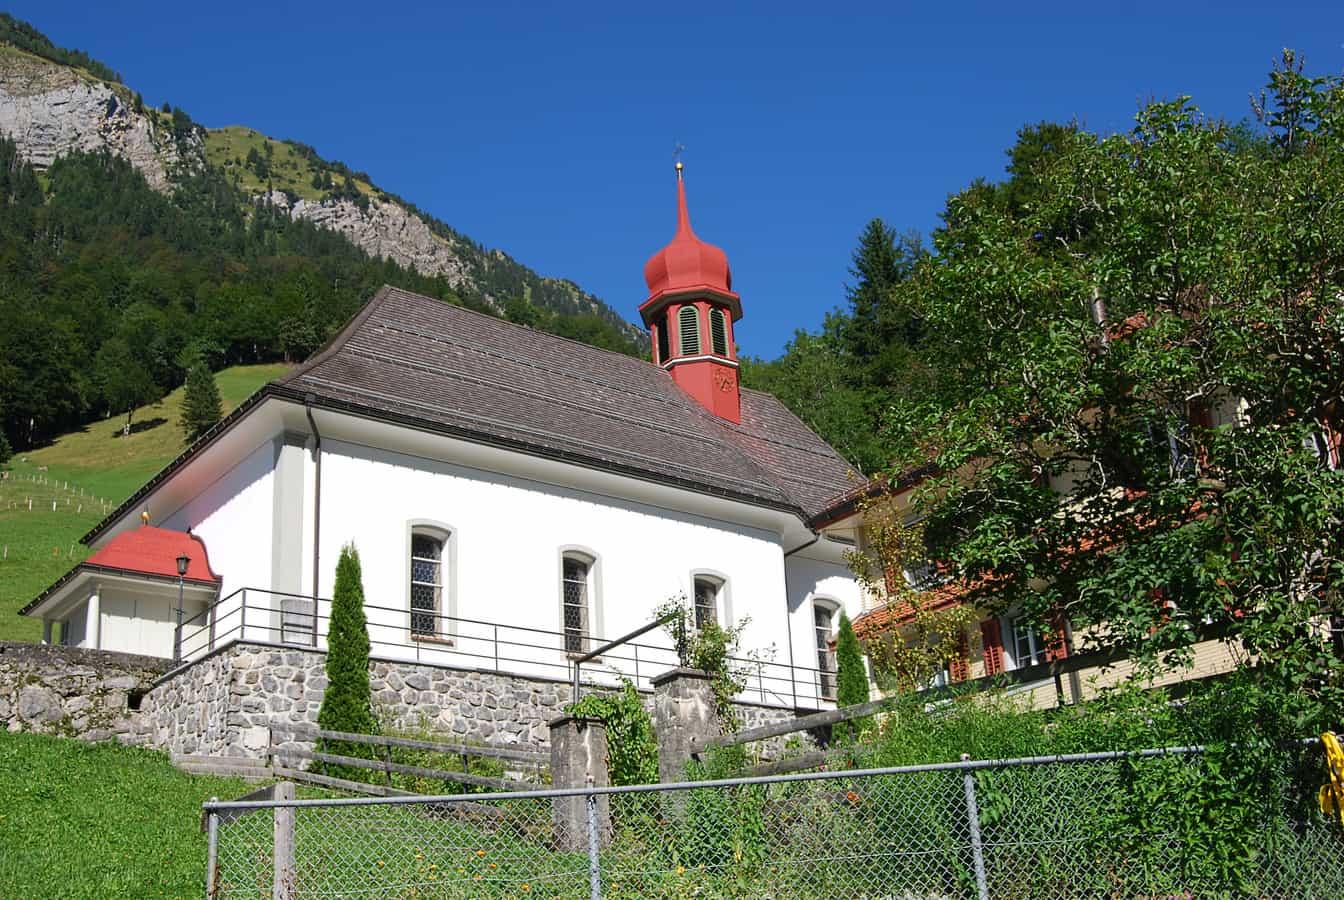 Katholische Pfarrkirche Maria zum Guten Rat